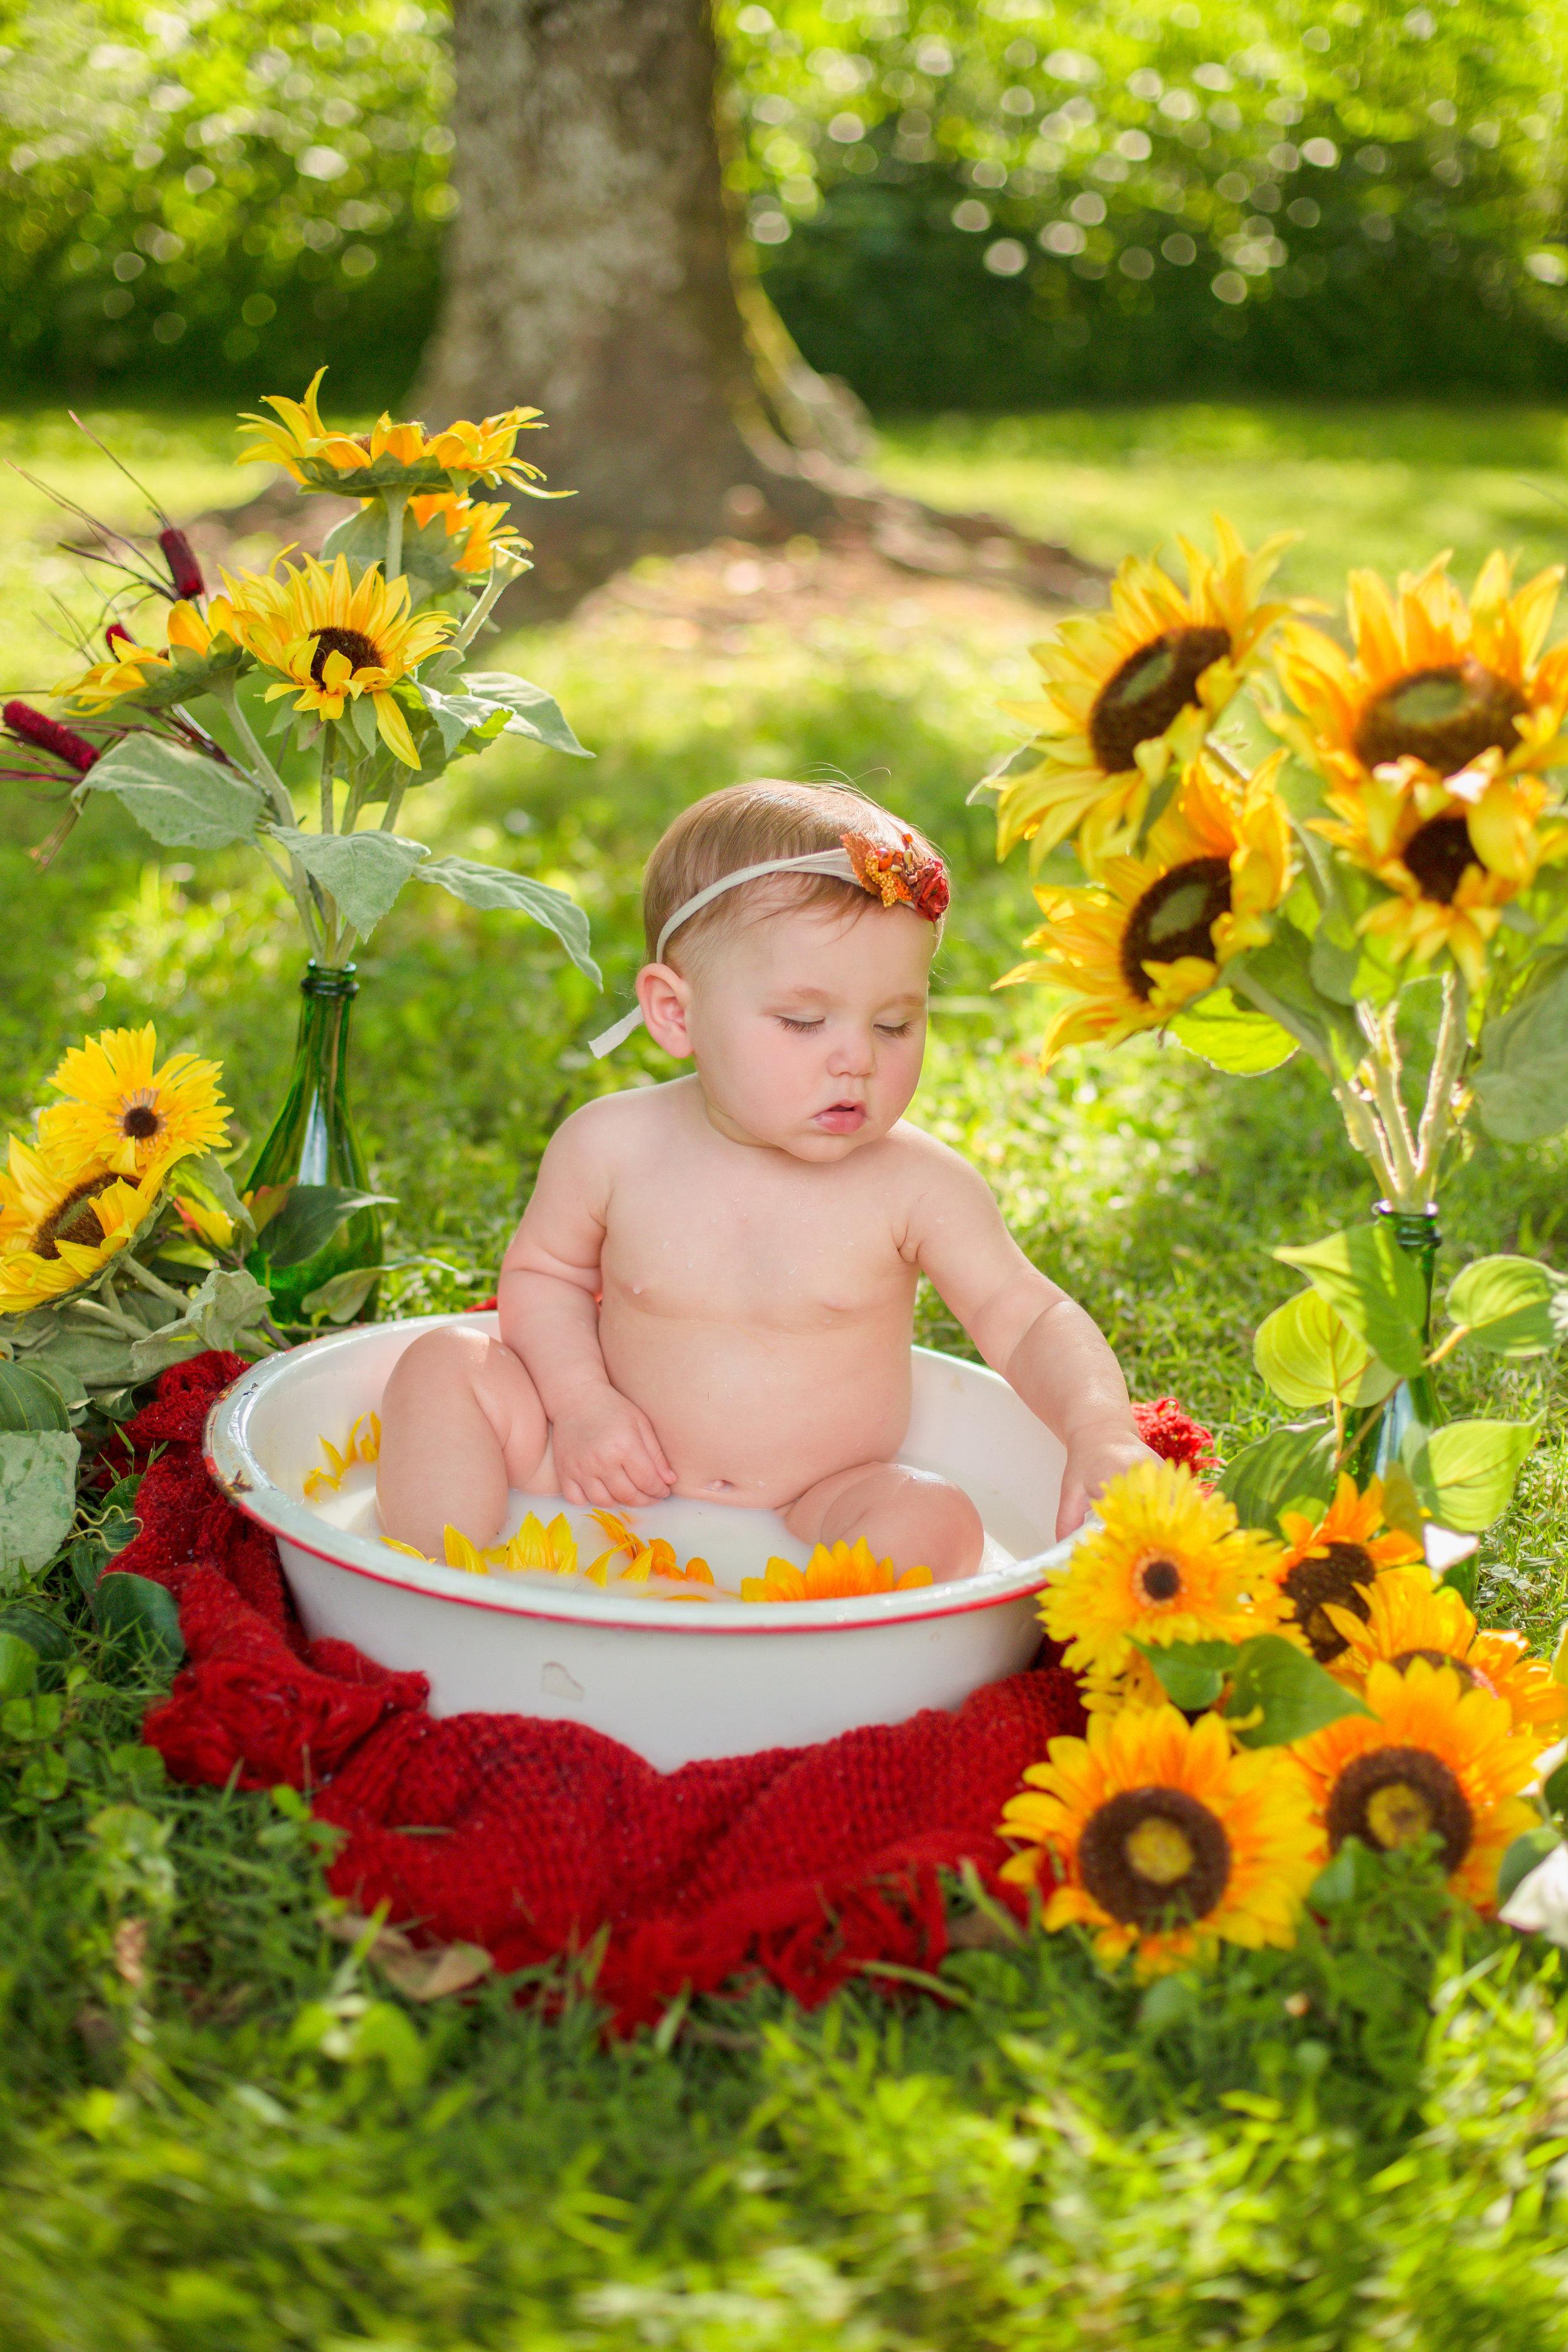 Sawyer-Jo-Sunflower-Milk-bath-Nashville-Family-Photographer-Chelsea-Meadows-Photography-(18).jpg